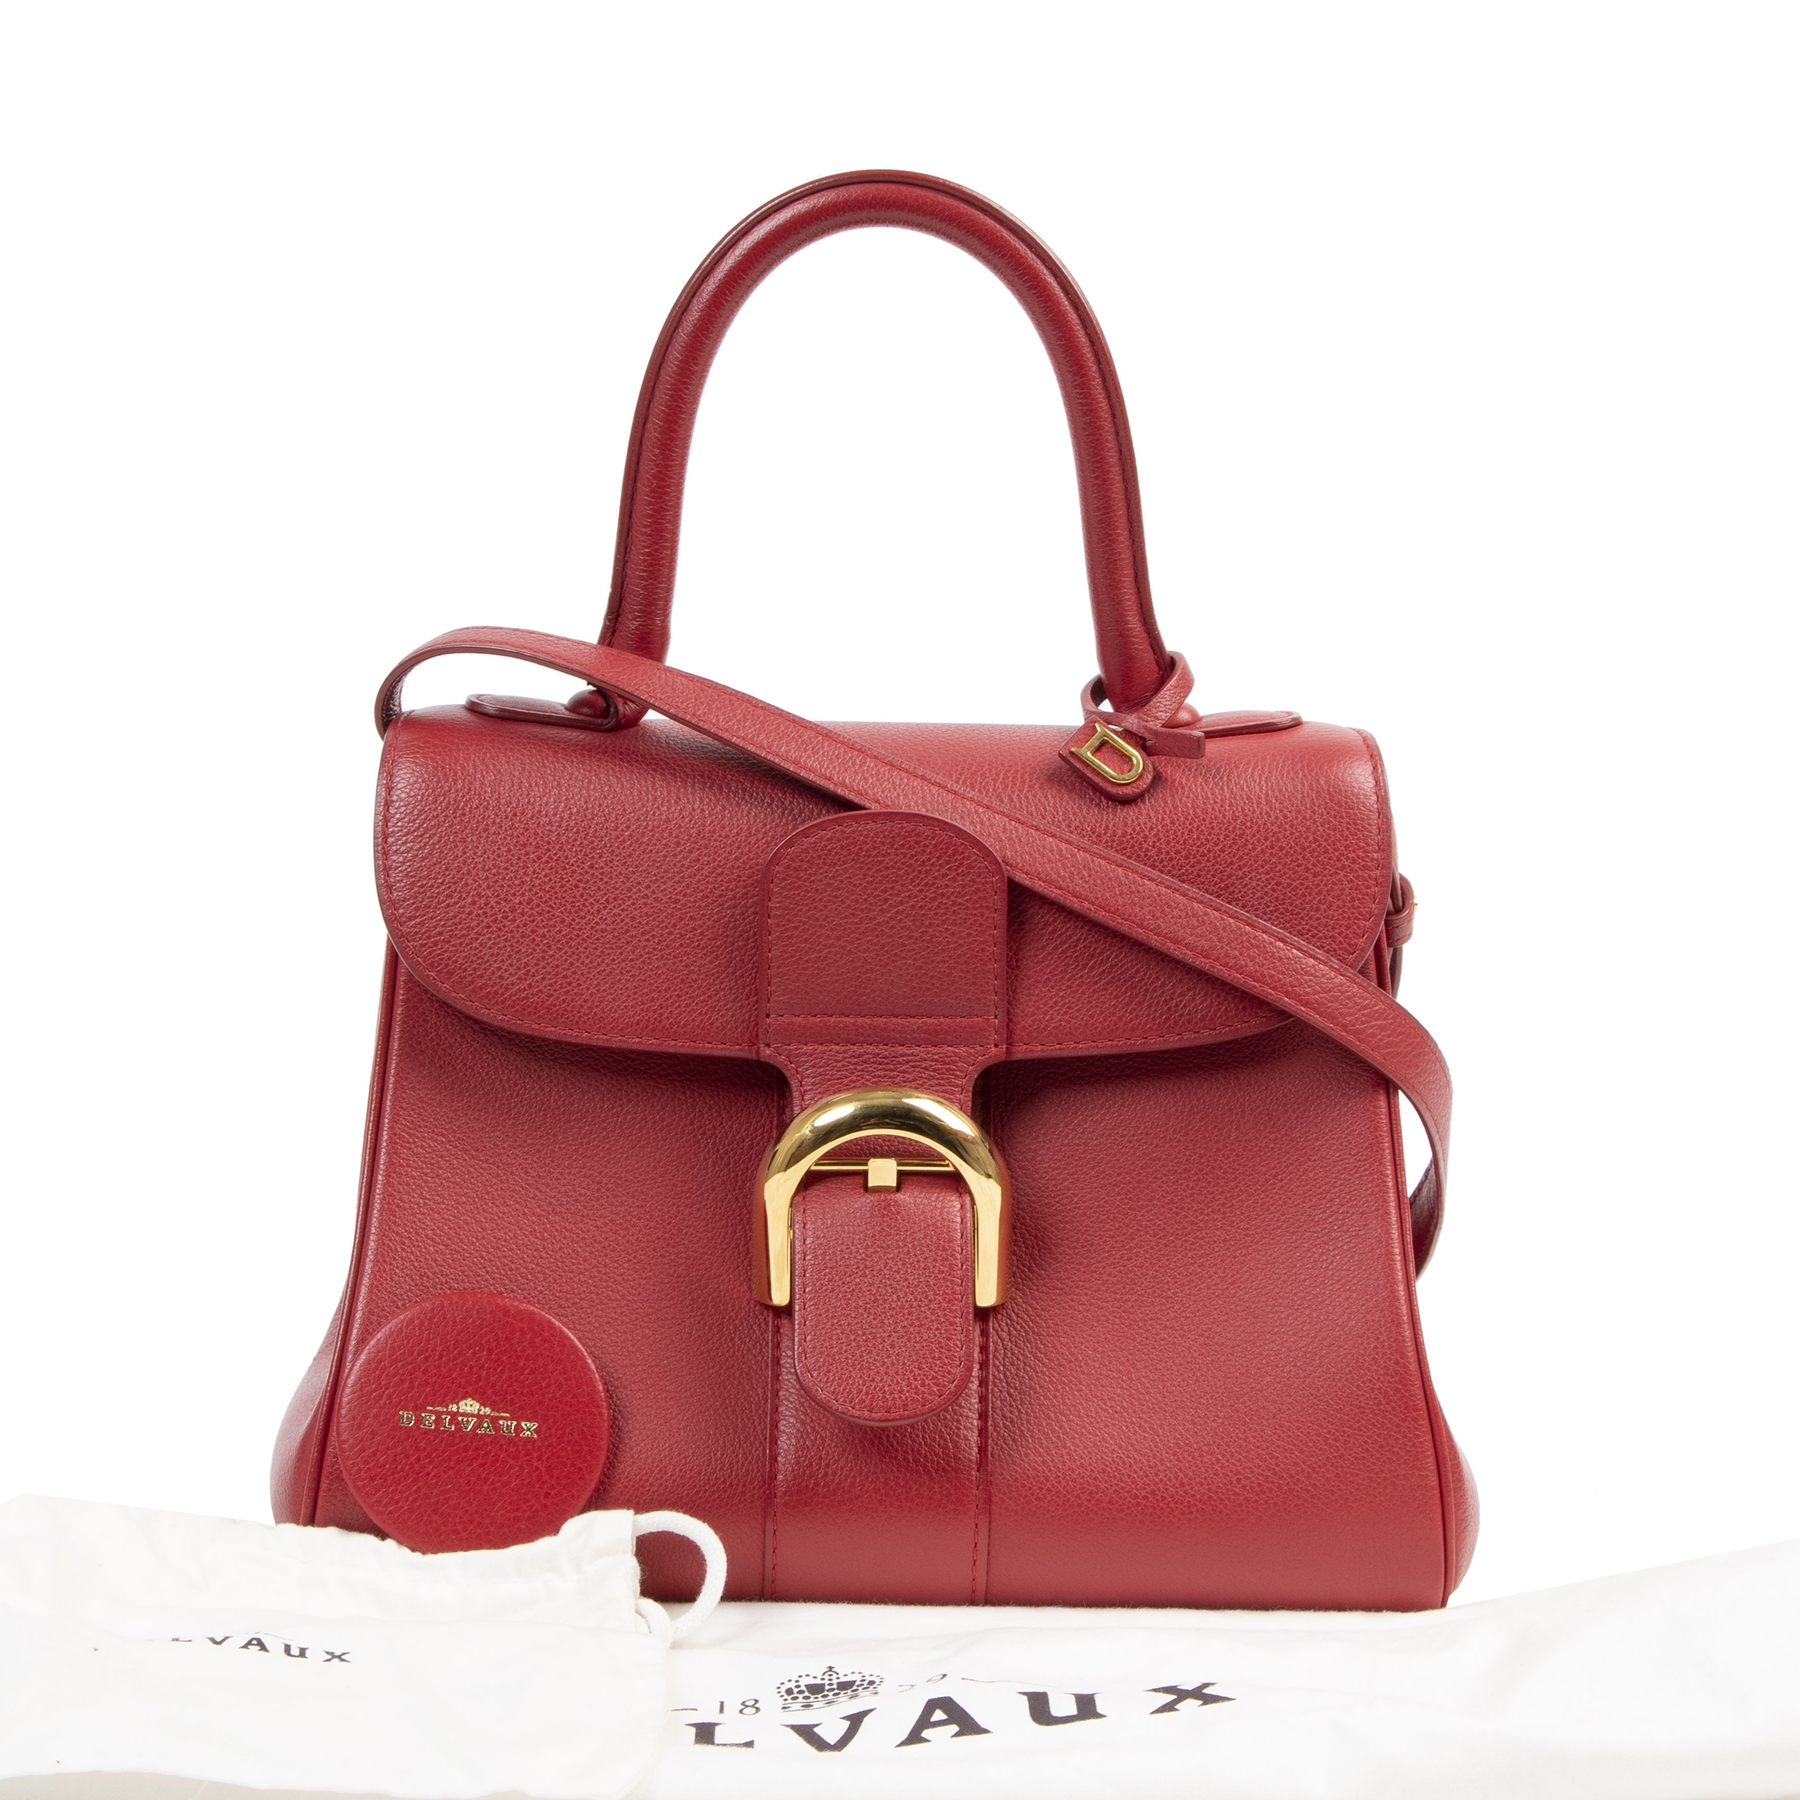 Authentic secondhand Delvaux Brick Red Brillant PM Handbag designer bags fashion luxury vintage webshop winkelen Antwerpen België mode fashion designer high end brands